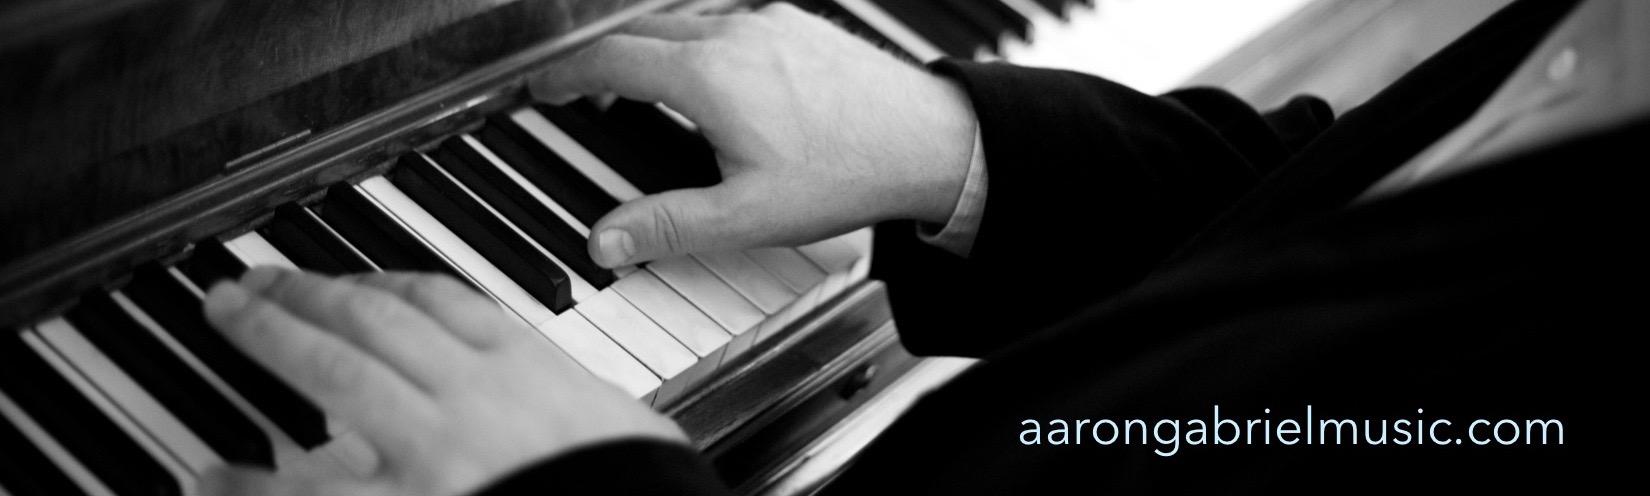 Aaron Gabriel Music